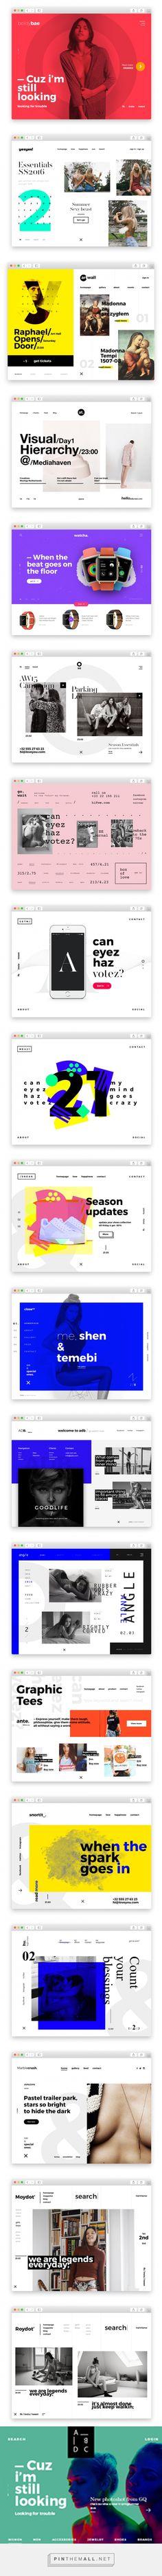 dribbble SS16.WEB/UI on Behance - created via https://pinthemall.net